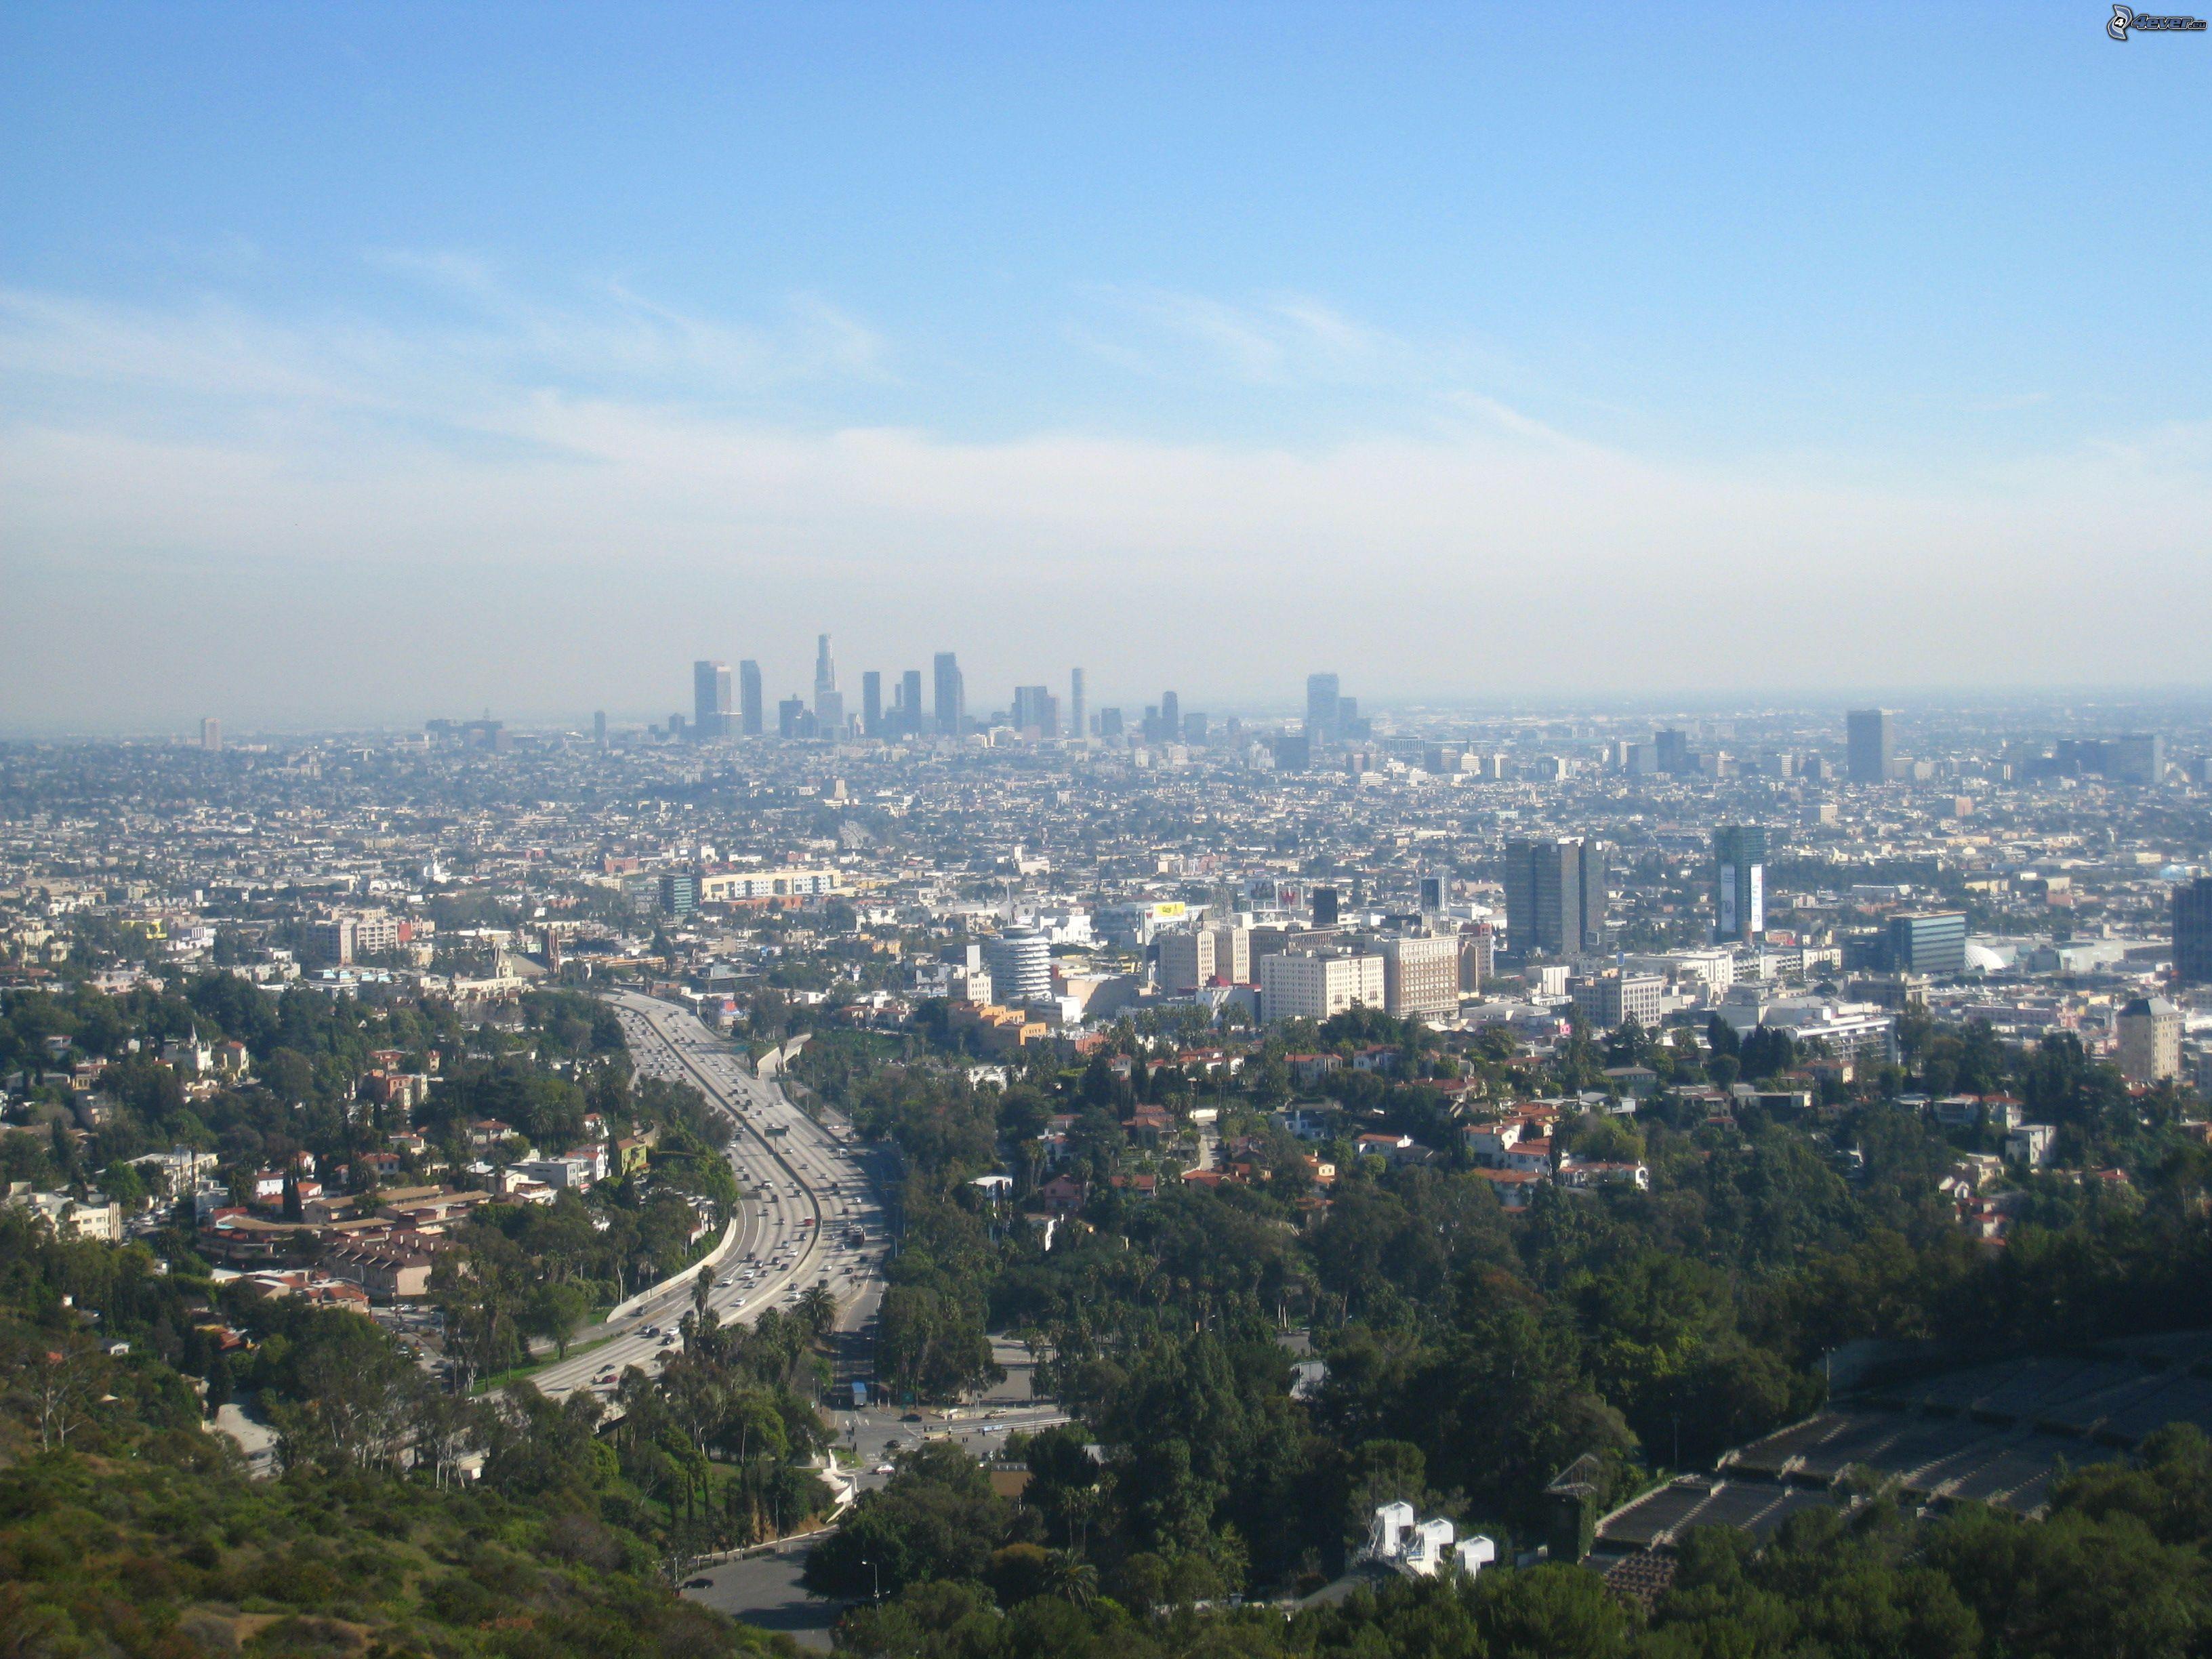 Hollywood Hills 3264x2448